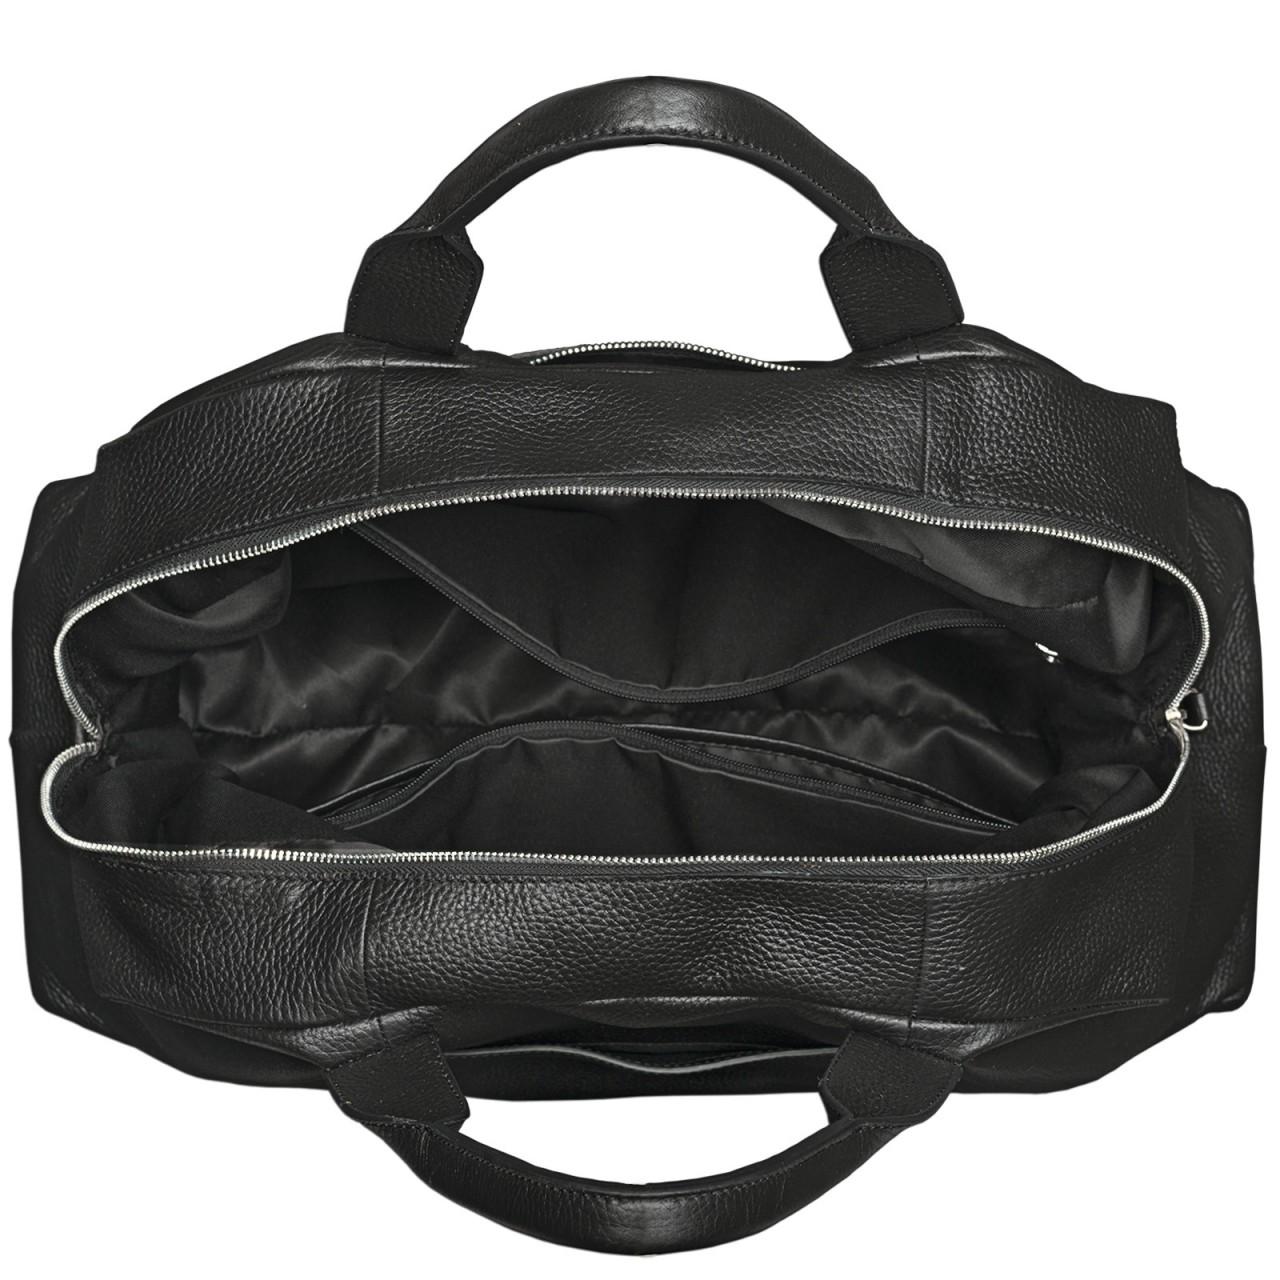 stilord reisetasche leder schwarz elegant gro mit. Black Bedroom Furniture Sets. Home Design Ideas